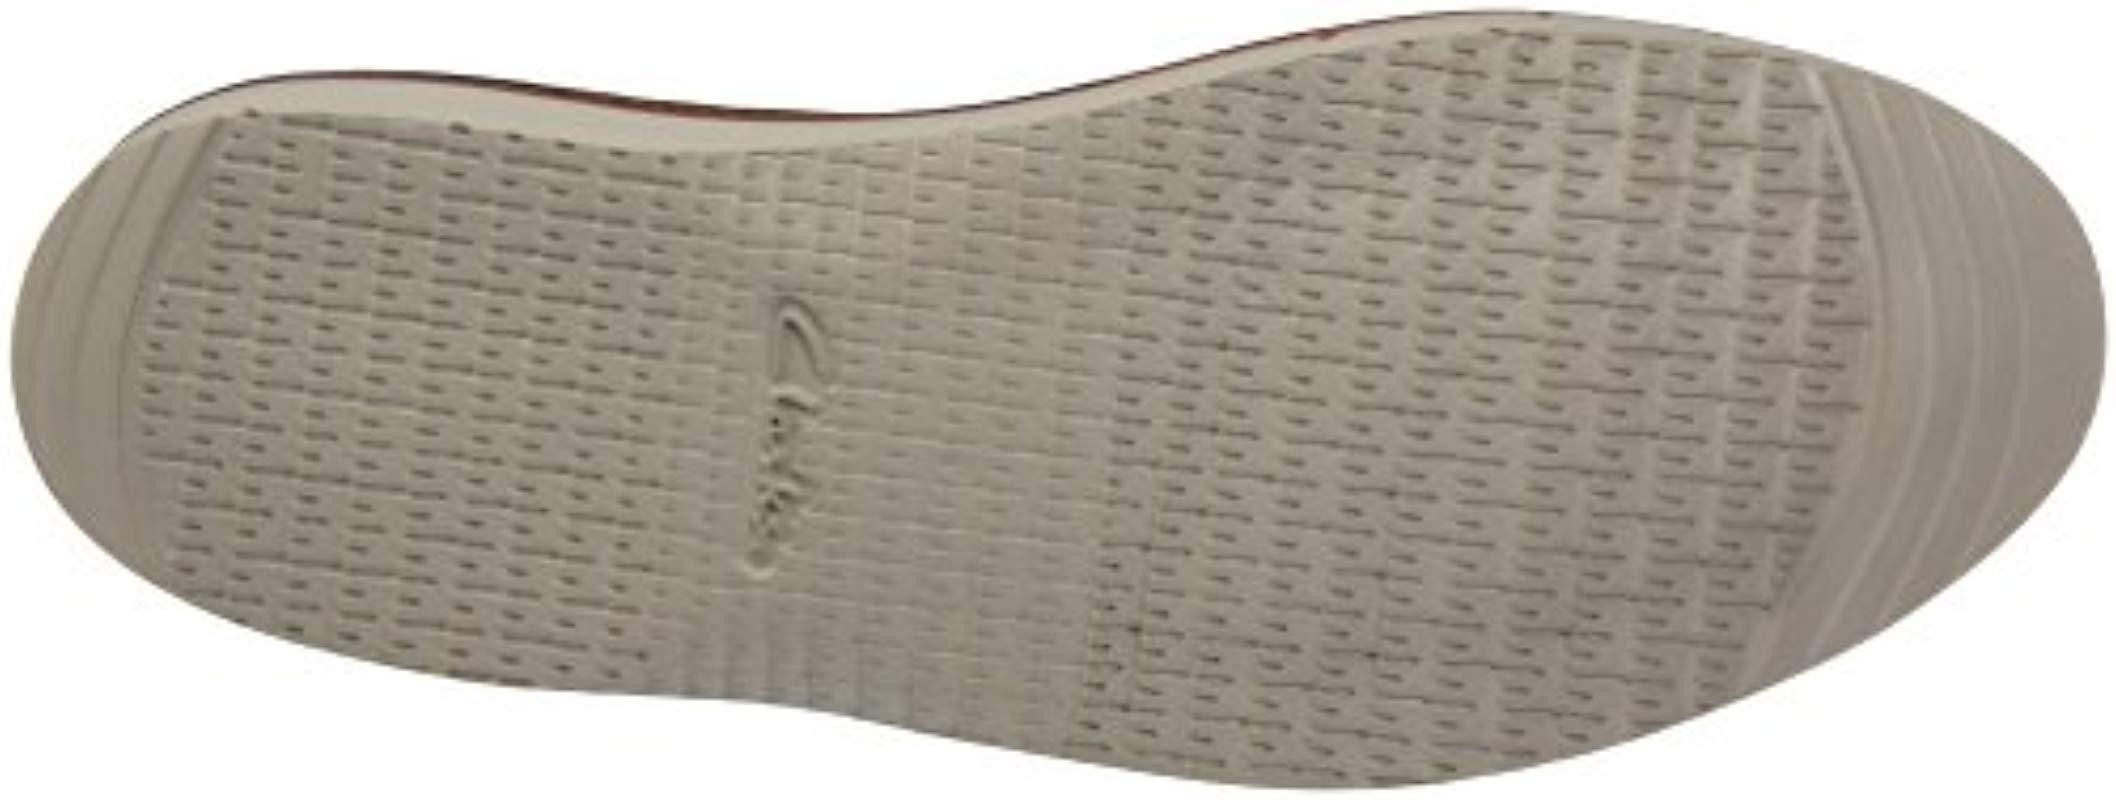 Capler Plain, Zapatos de Vestir para Hombre Clarks de hombre de color Marrón